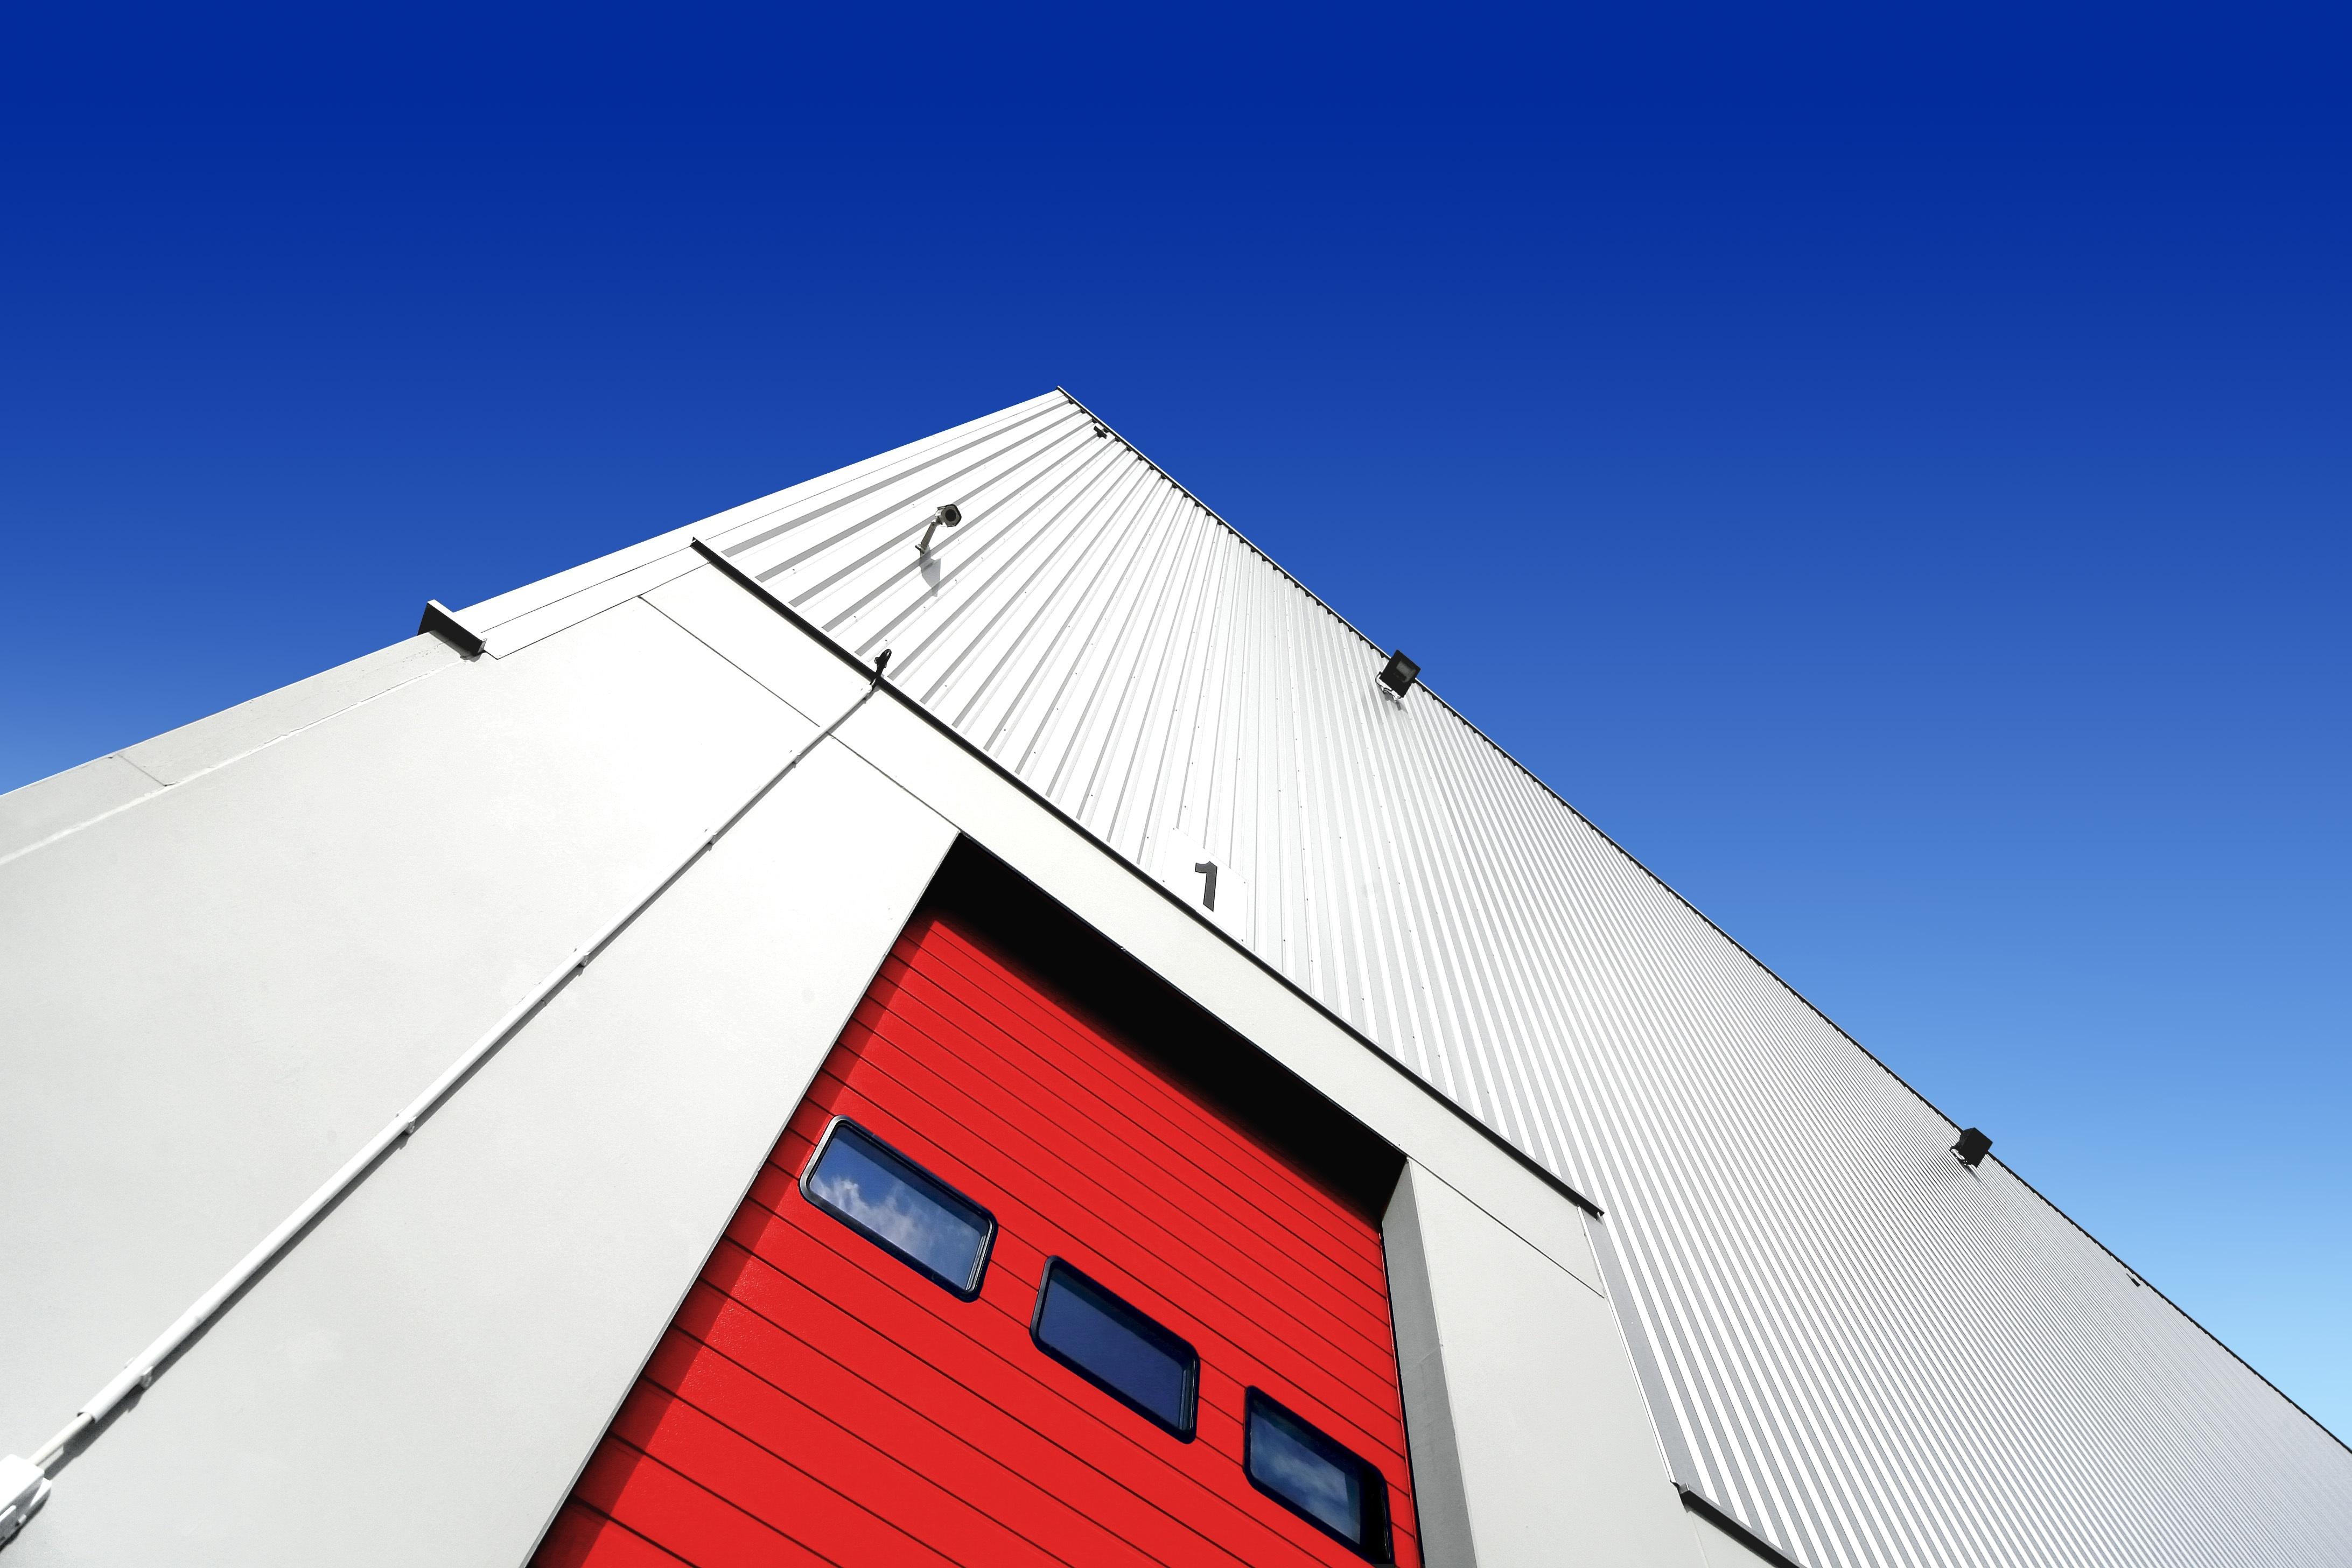 Industrial_Warehouse_Exterior_shutterstock_141083665_ML.jpg